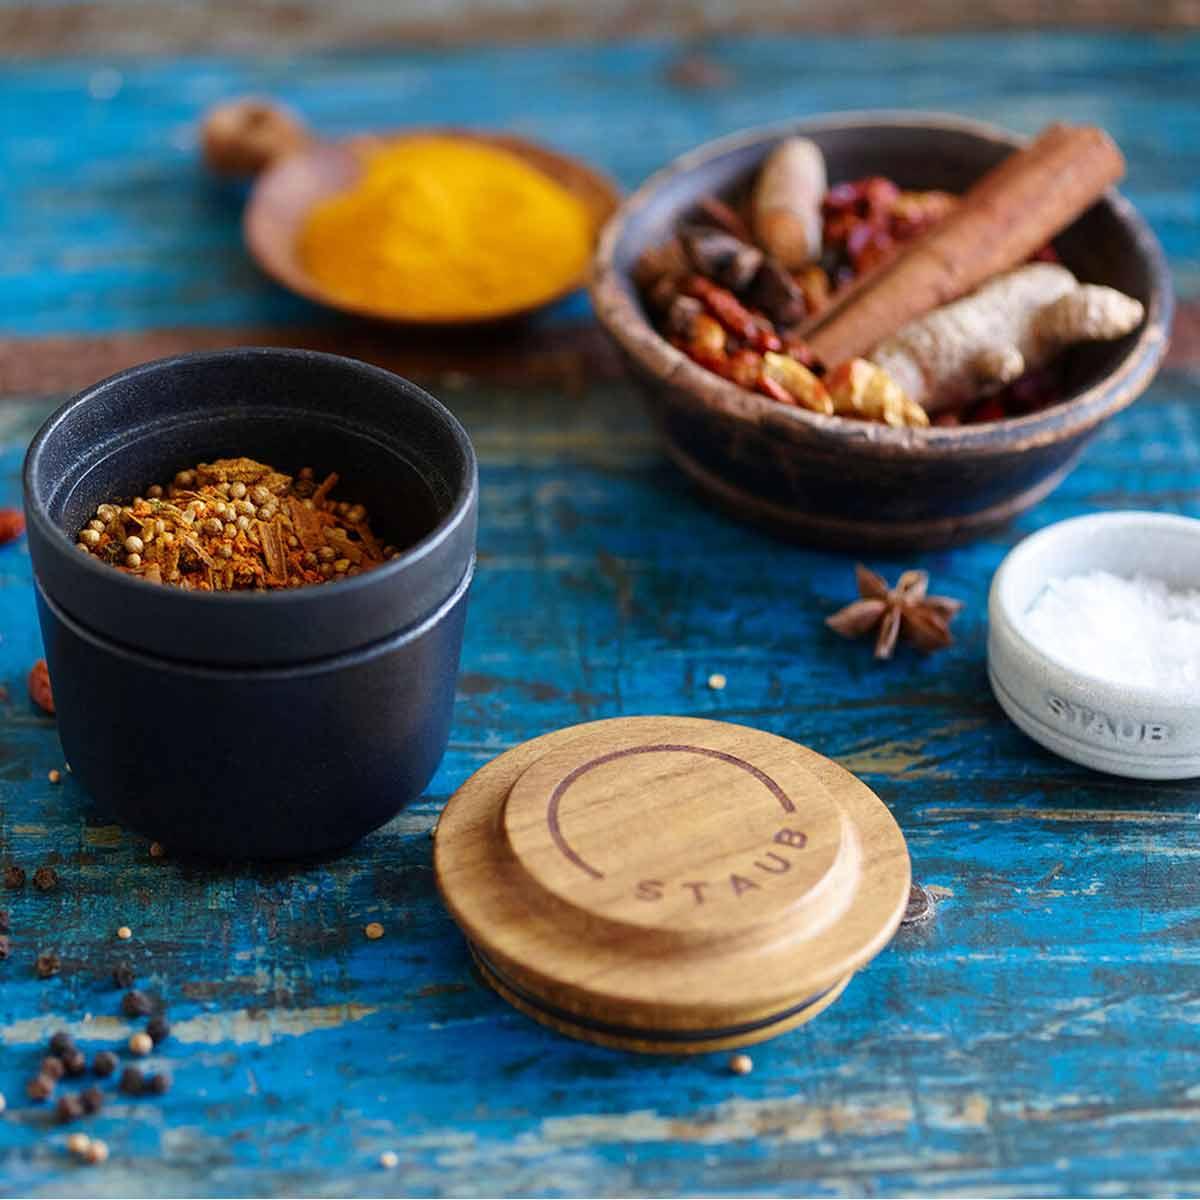 Staub Vintage Spice Grinder with star anise